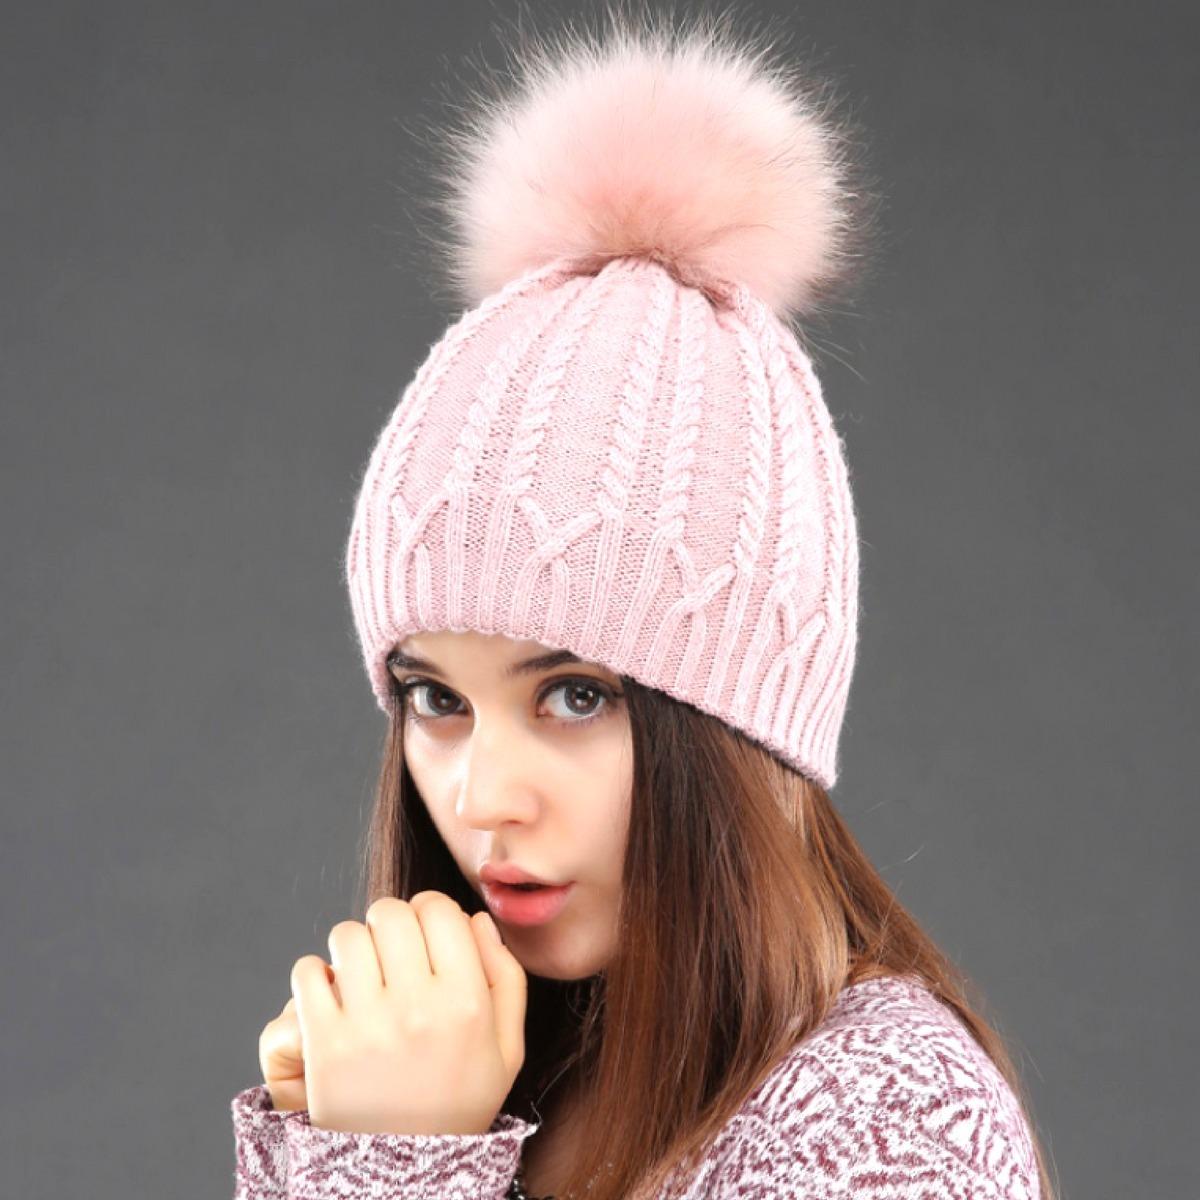 Touca Gorro Feminino Moda Inverno Das Meninas - R  147 ded3f832493